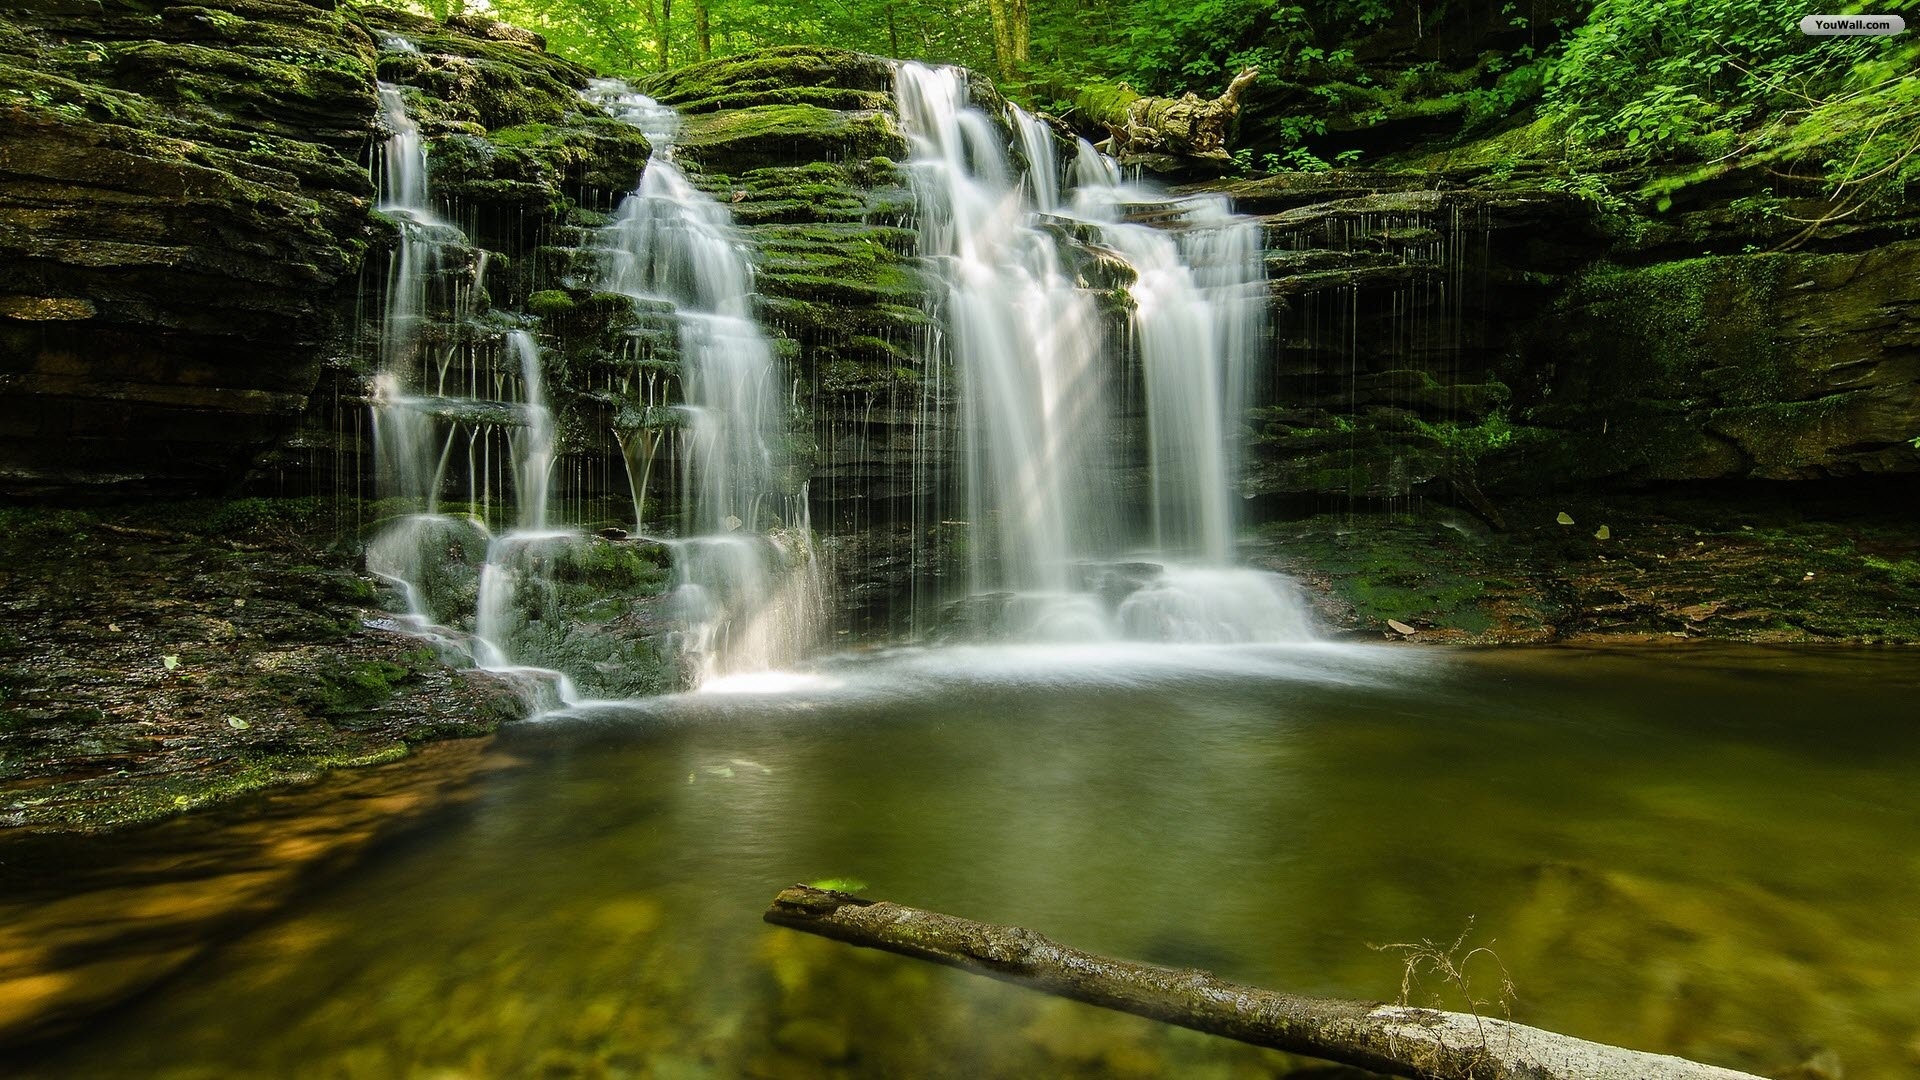 Geen Forest Waterfalls YouWall – Geen Forest Waterfalls Wallpaper –  wallpaper,wallpapers